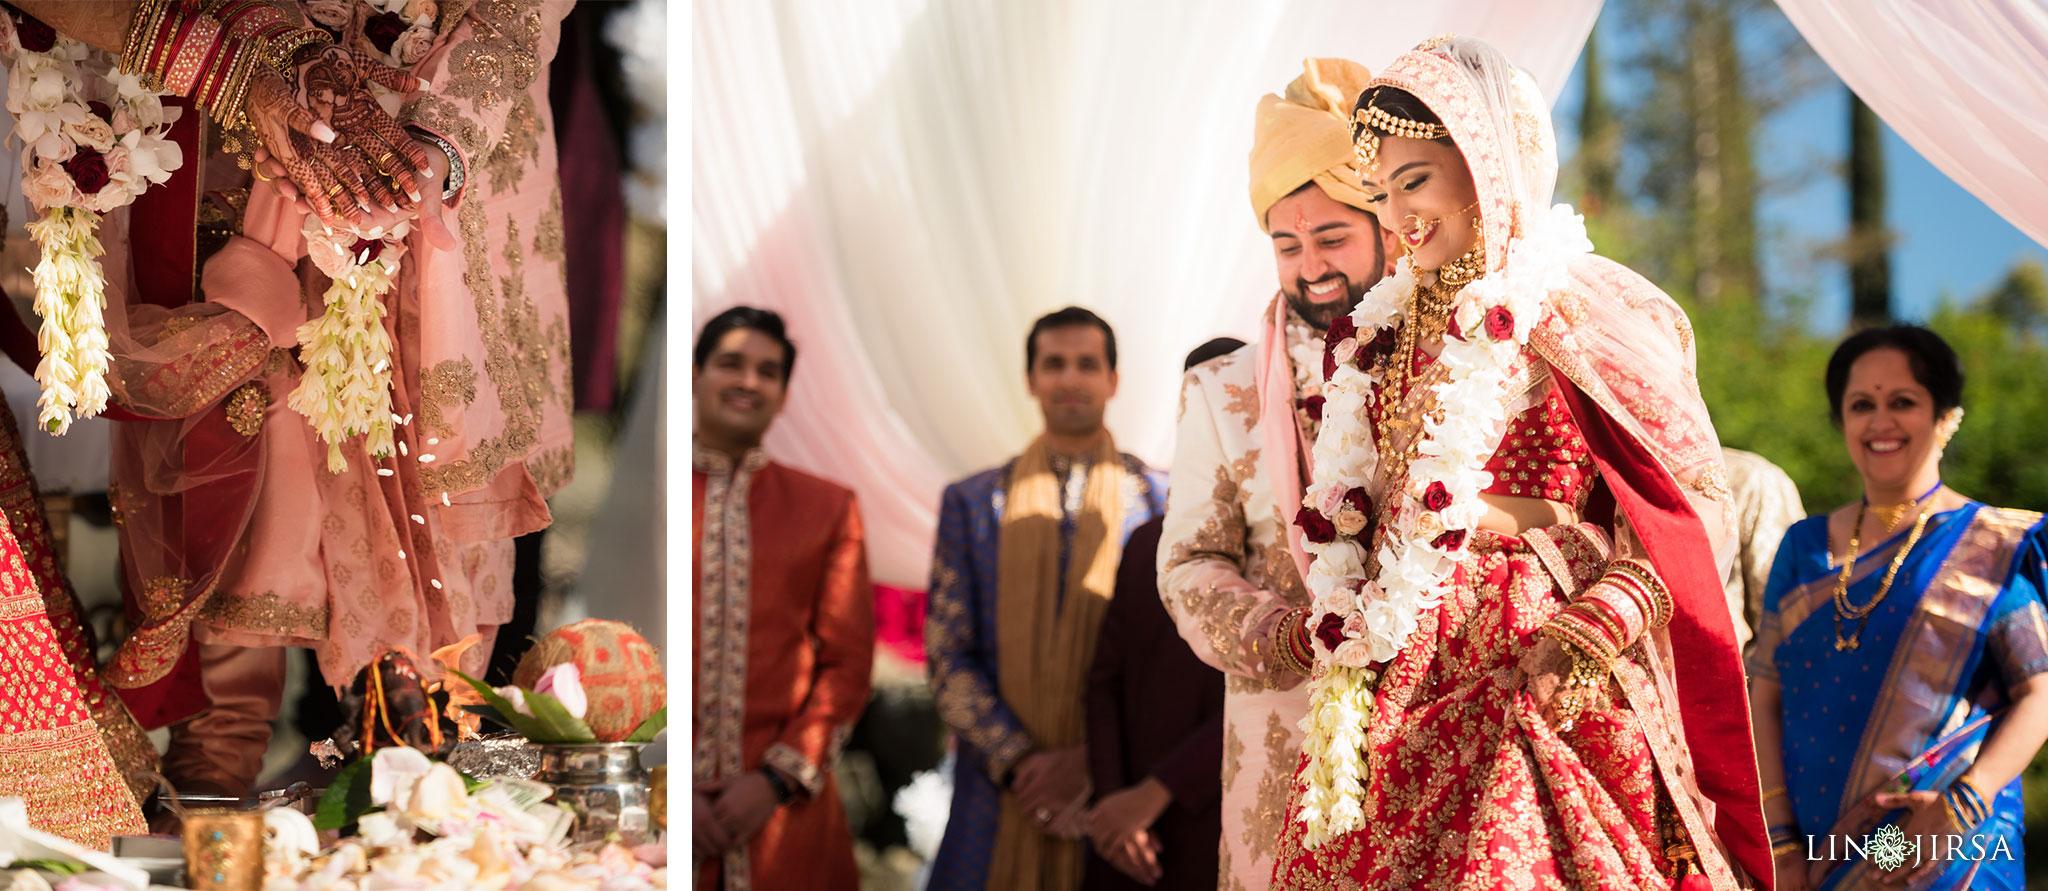 34 four seasons westlake village indian wedding ceremony photography